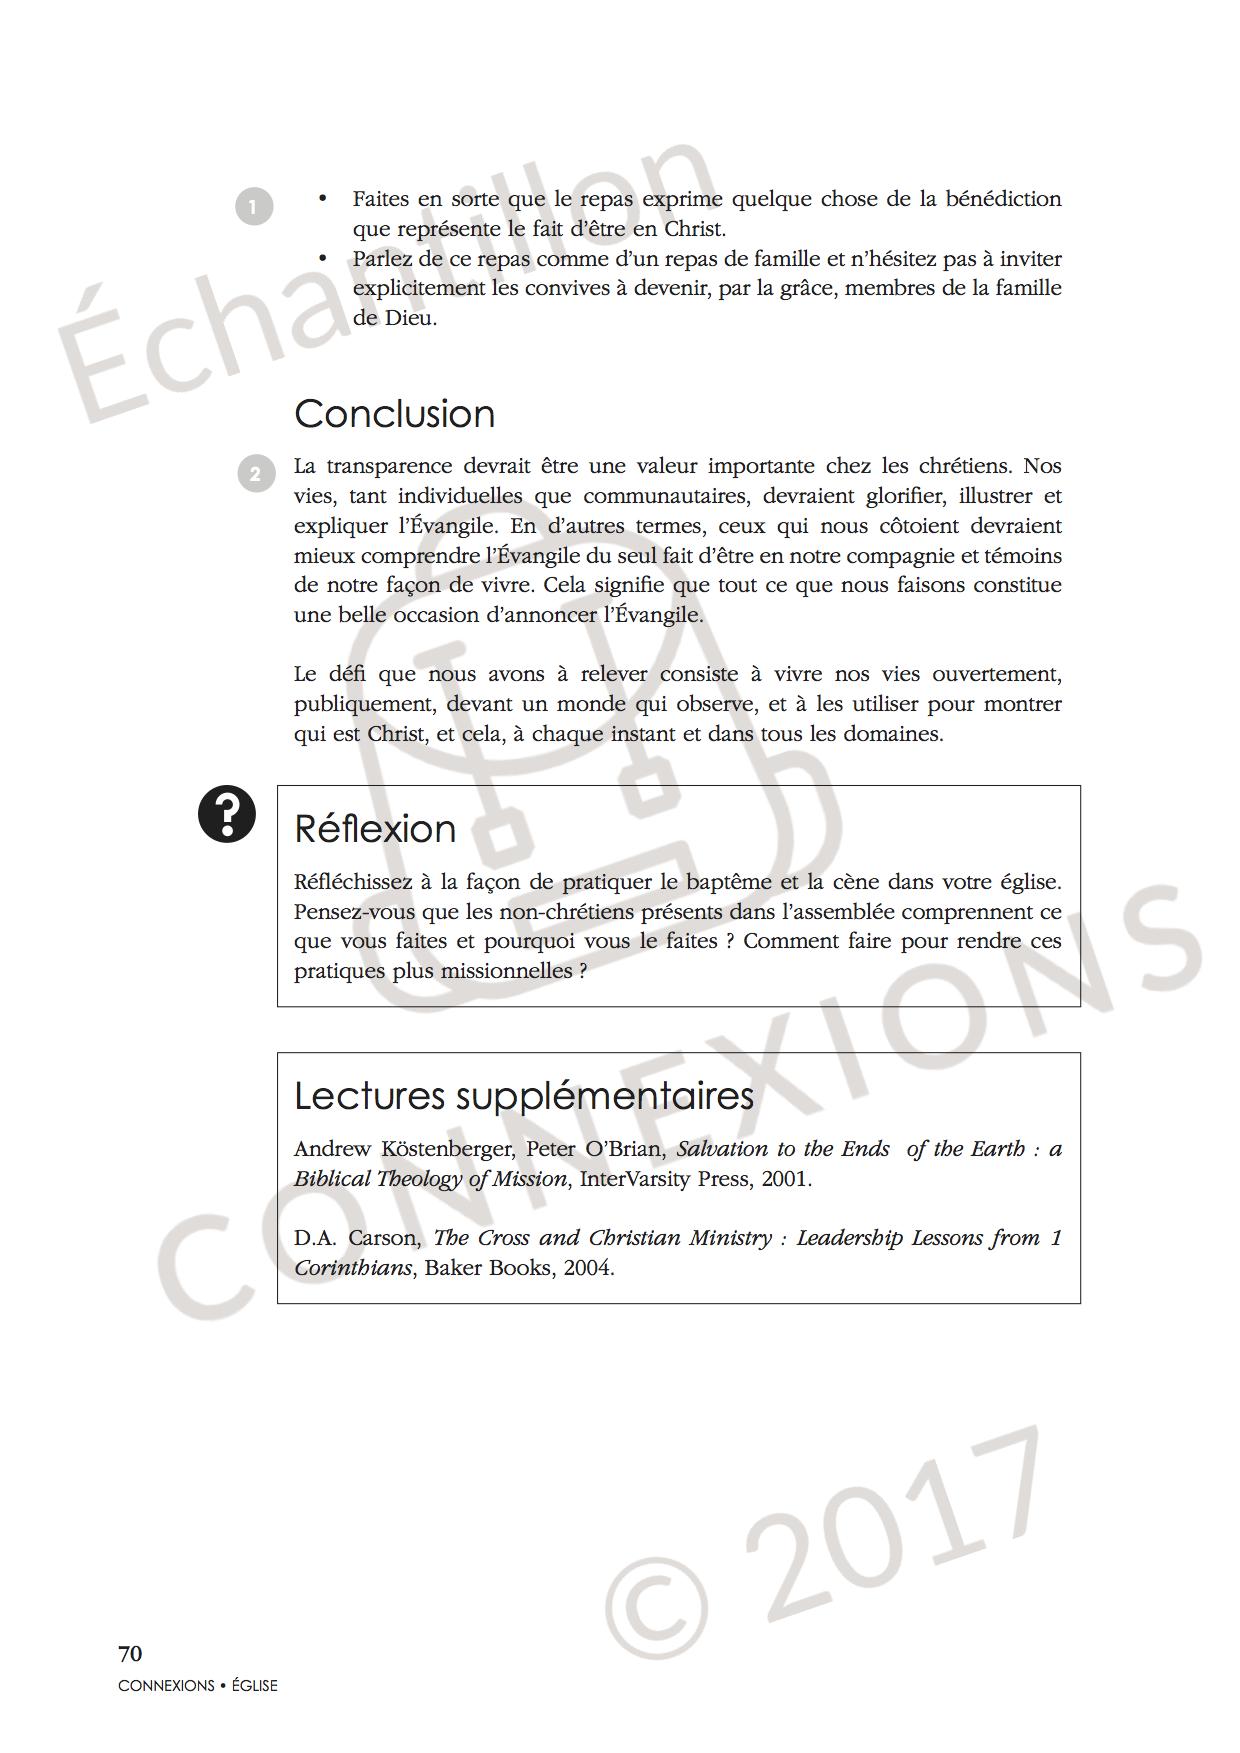 Garder le cap missionnel_sample_published.7.png